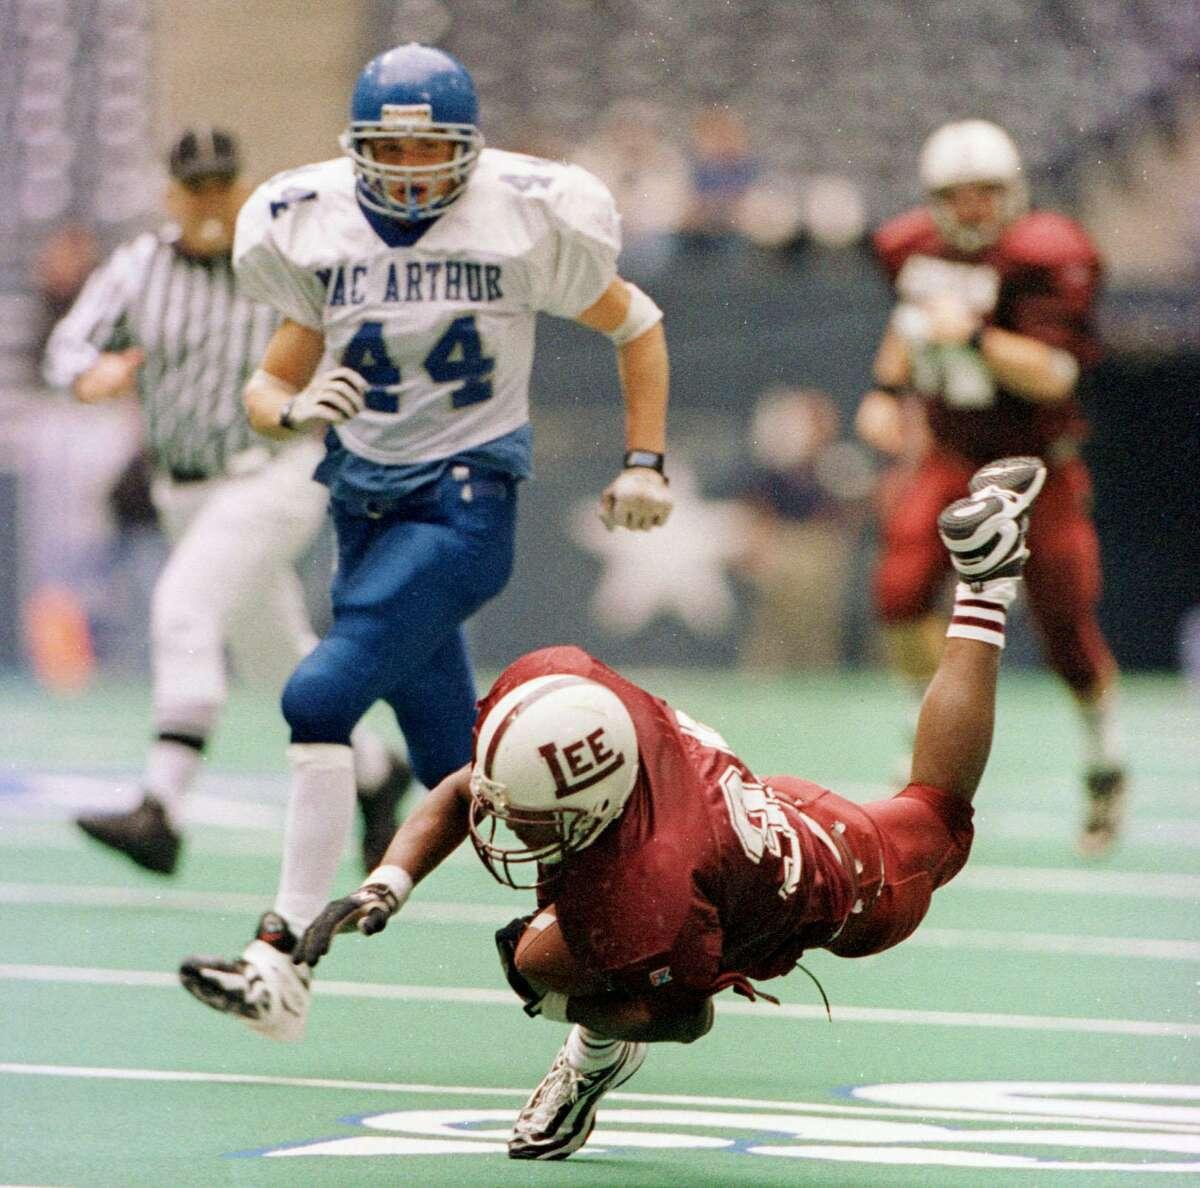 In Texas Stadium in Dallas Saturday Dec. 19, 1998, Midland Lee High School TB Cedric Benson , who scored 5 TD's (1pass) and 4 runs, stumbles in the 2nd quarter as San Antonio's MacArthur High School LB Joey Johnson (44) looks on.